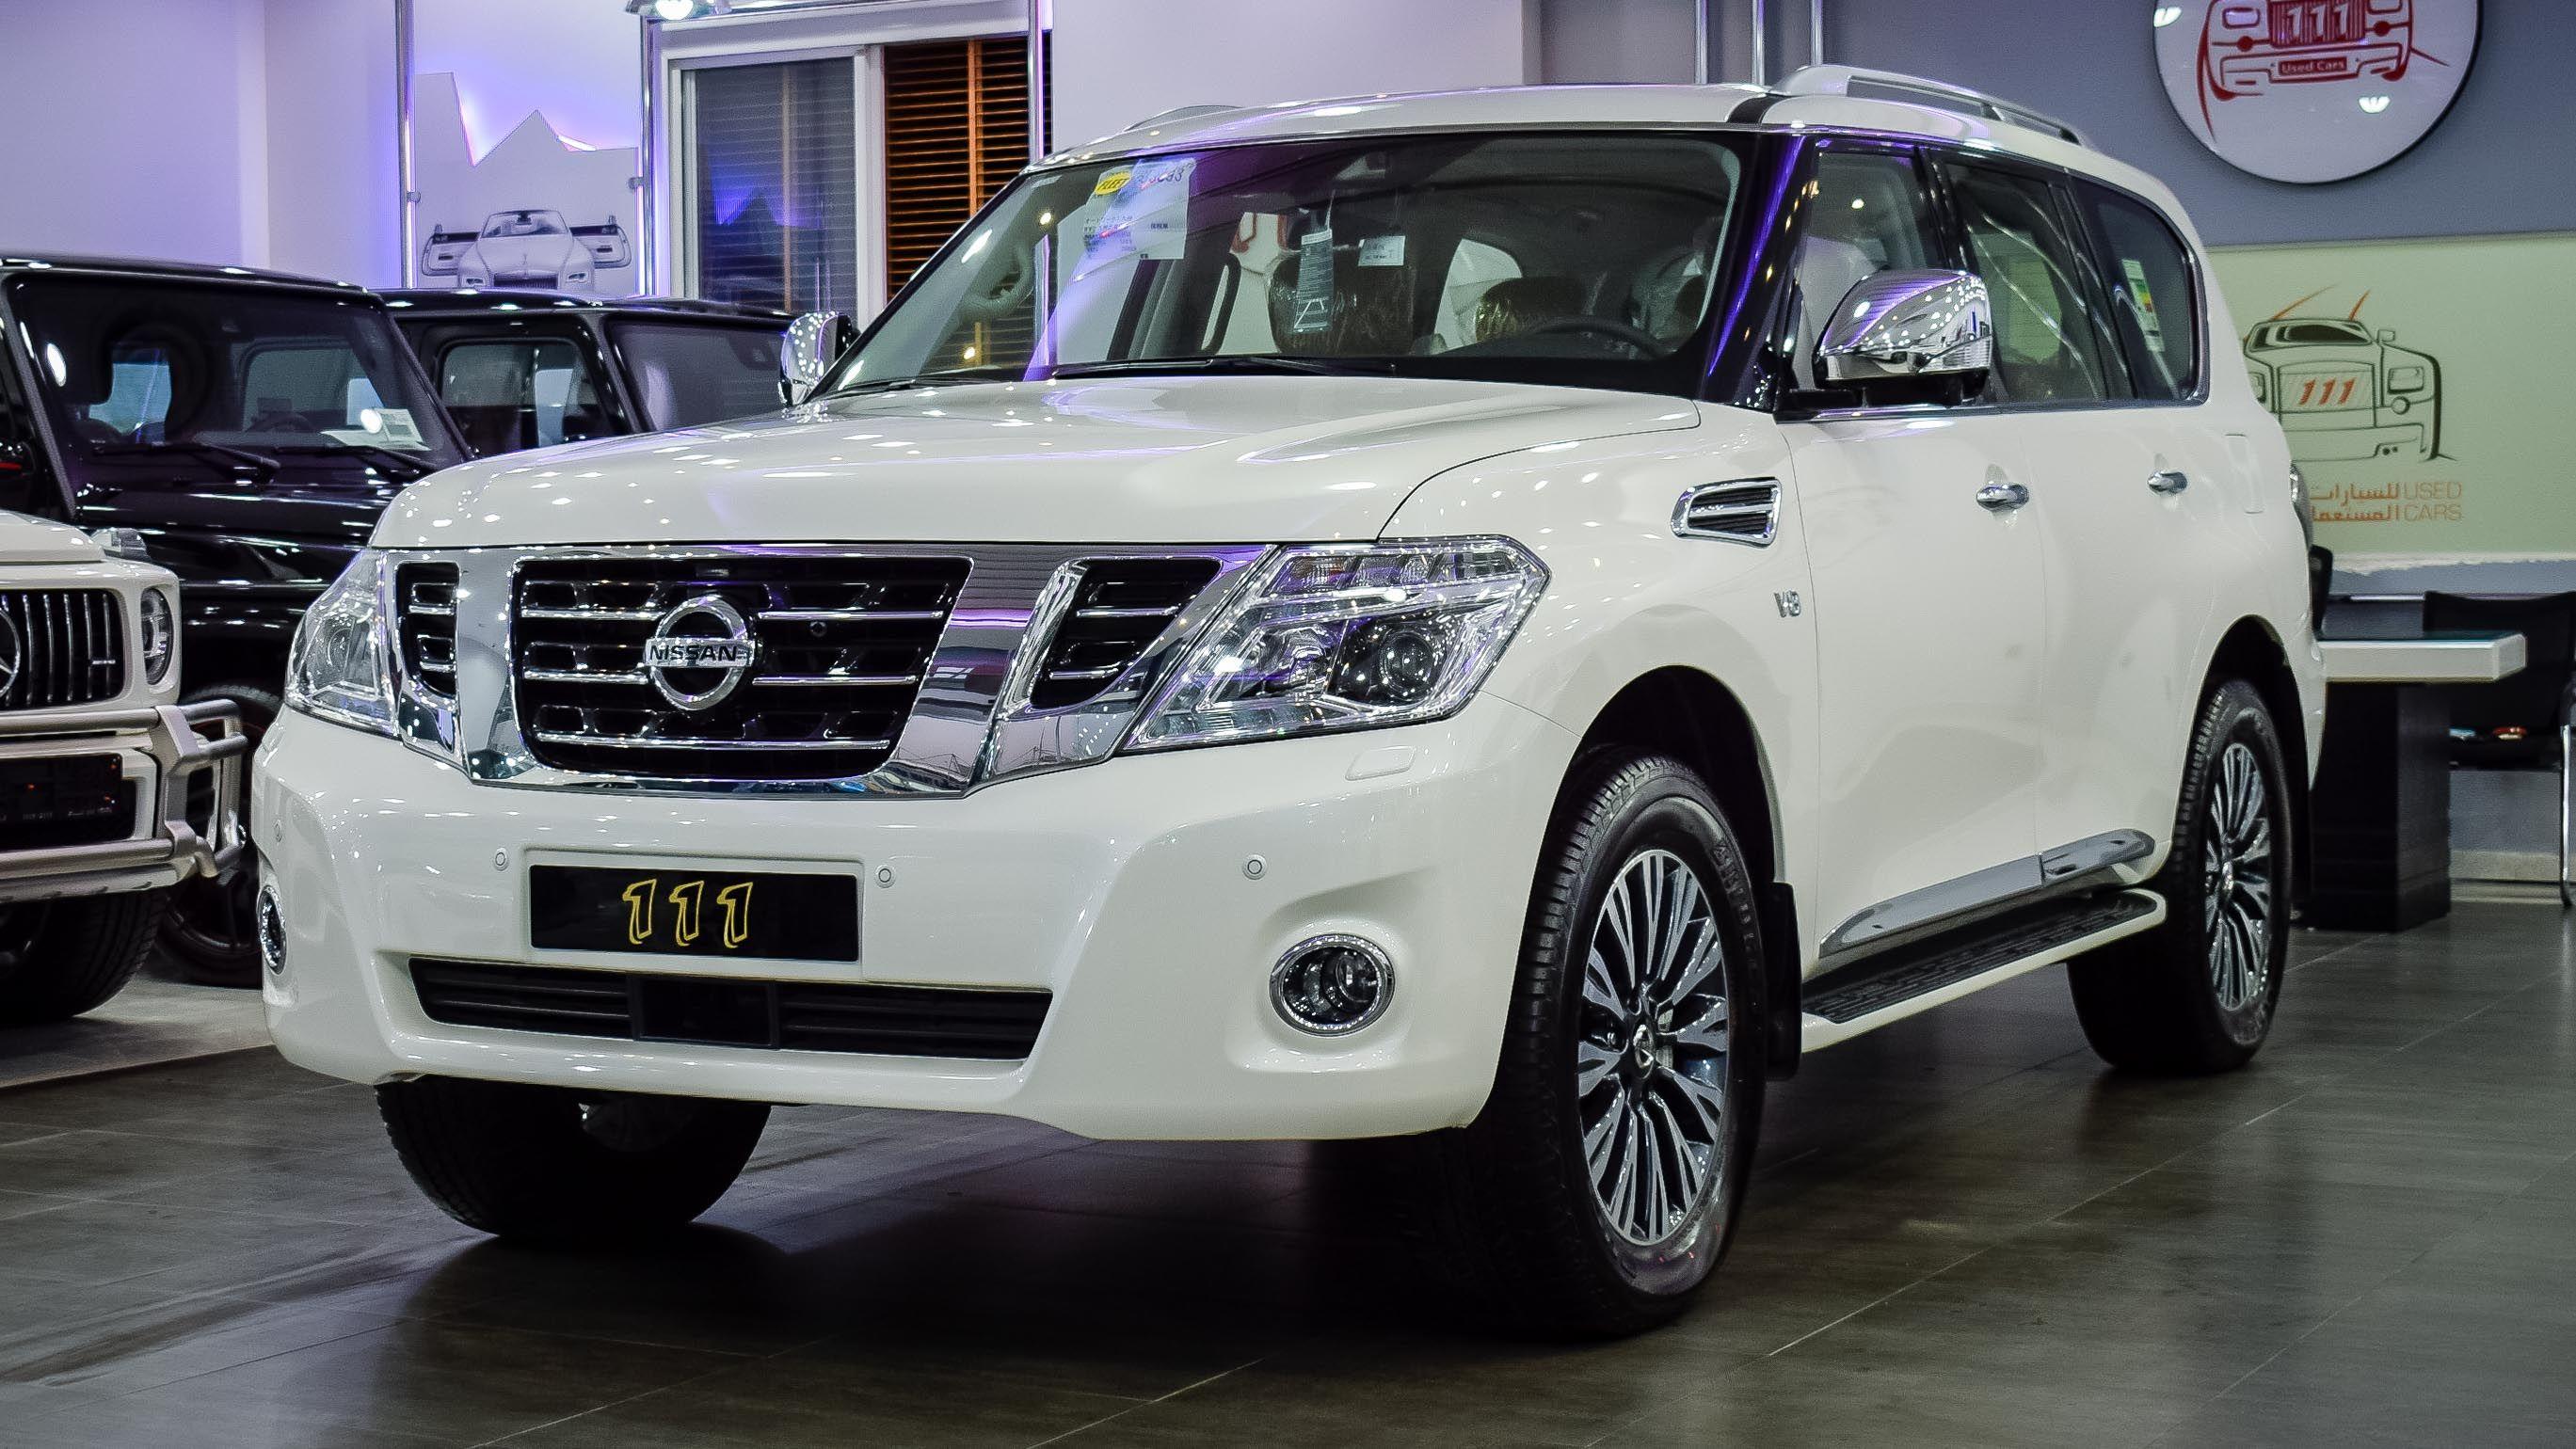 2018 Nissan Patrol Platinum Vvel Dig Gcc Specs Warranty Nissan Patrol Nissan Car